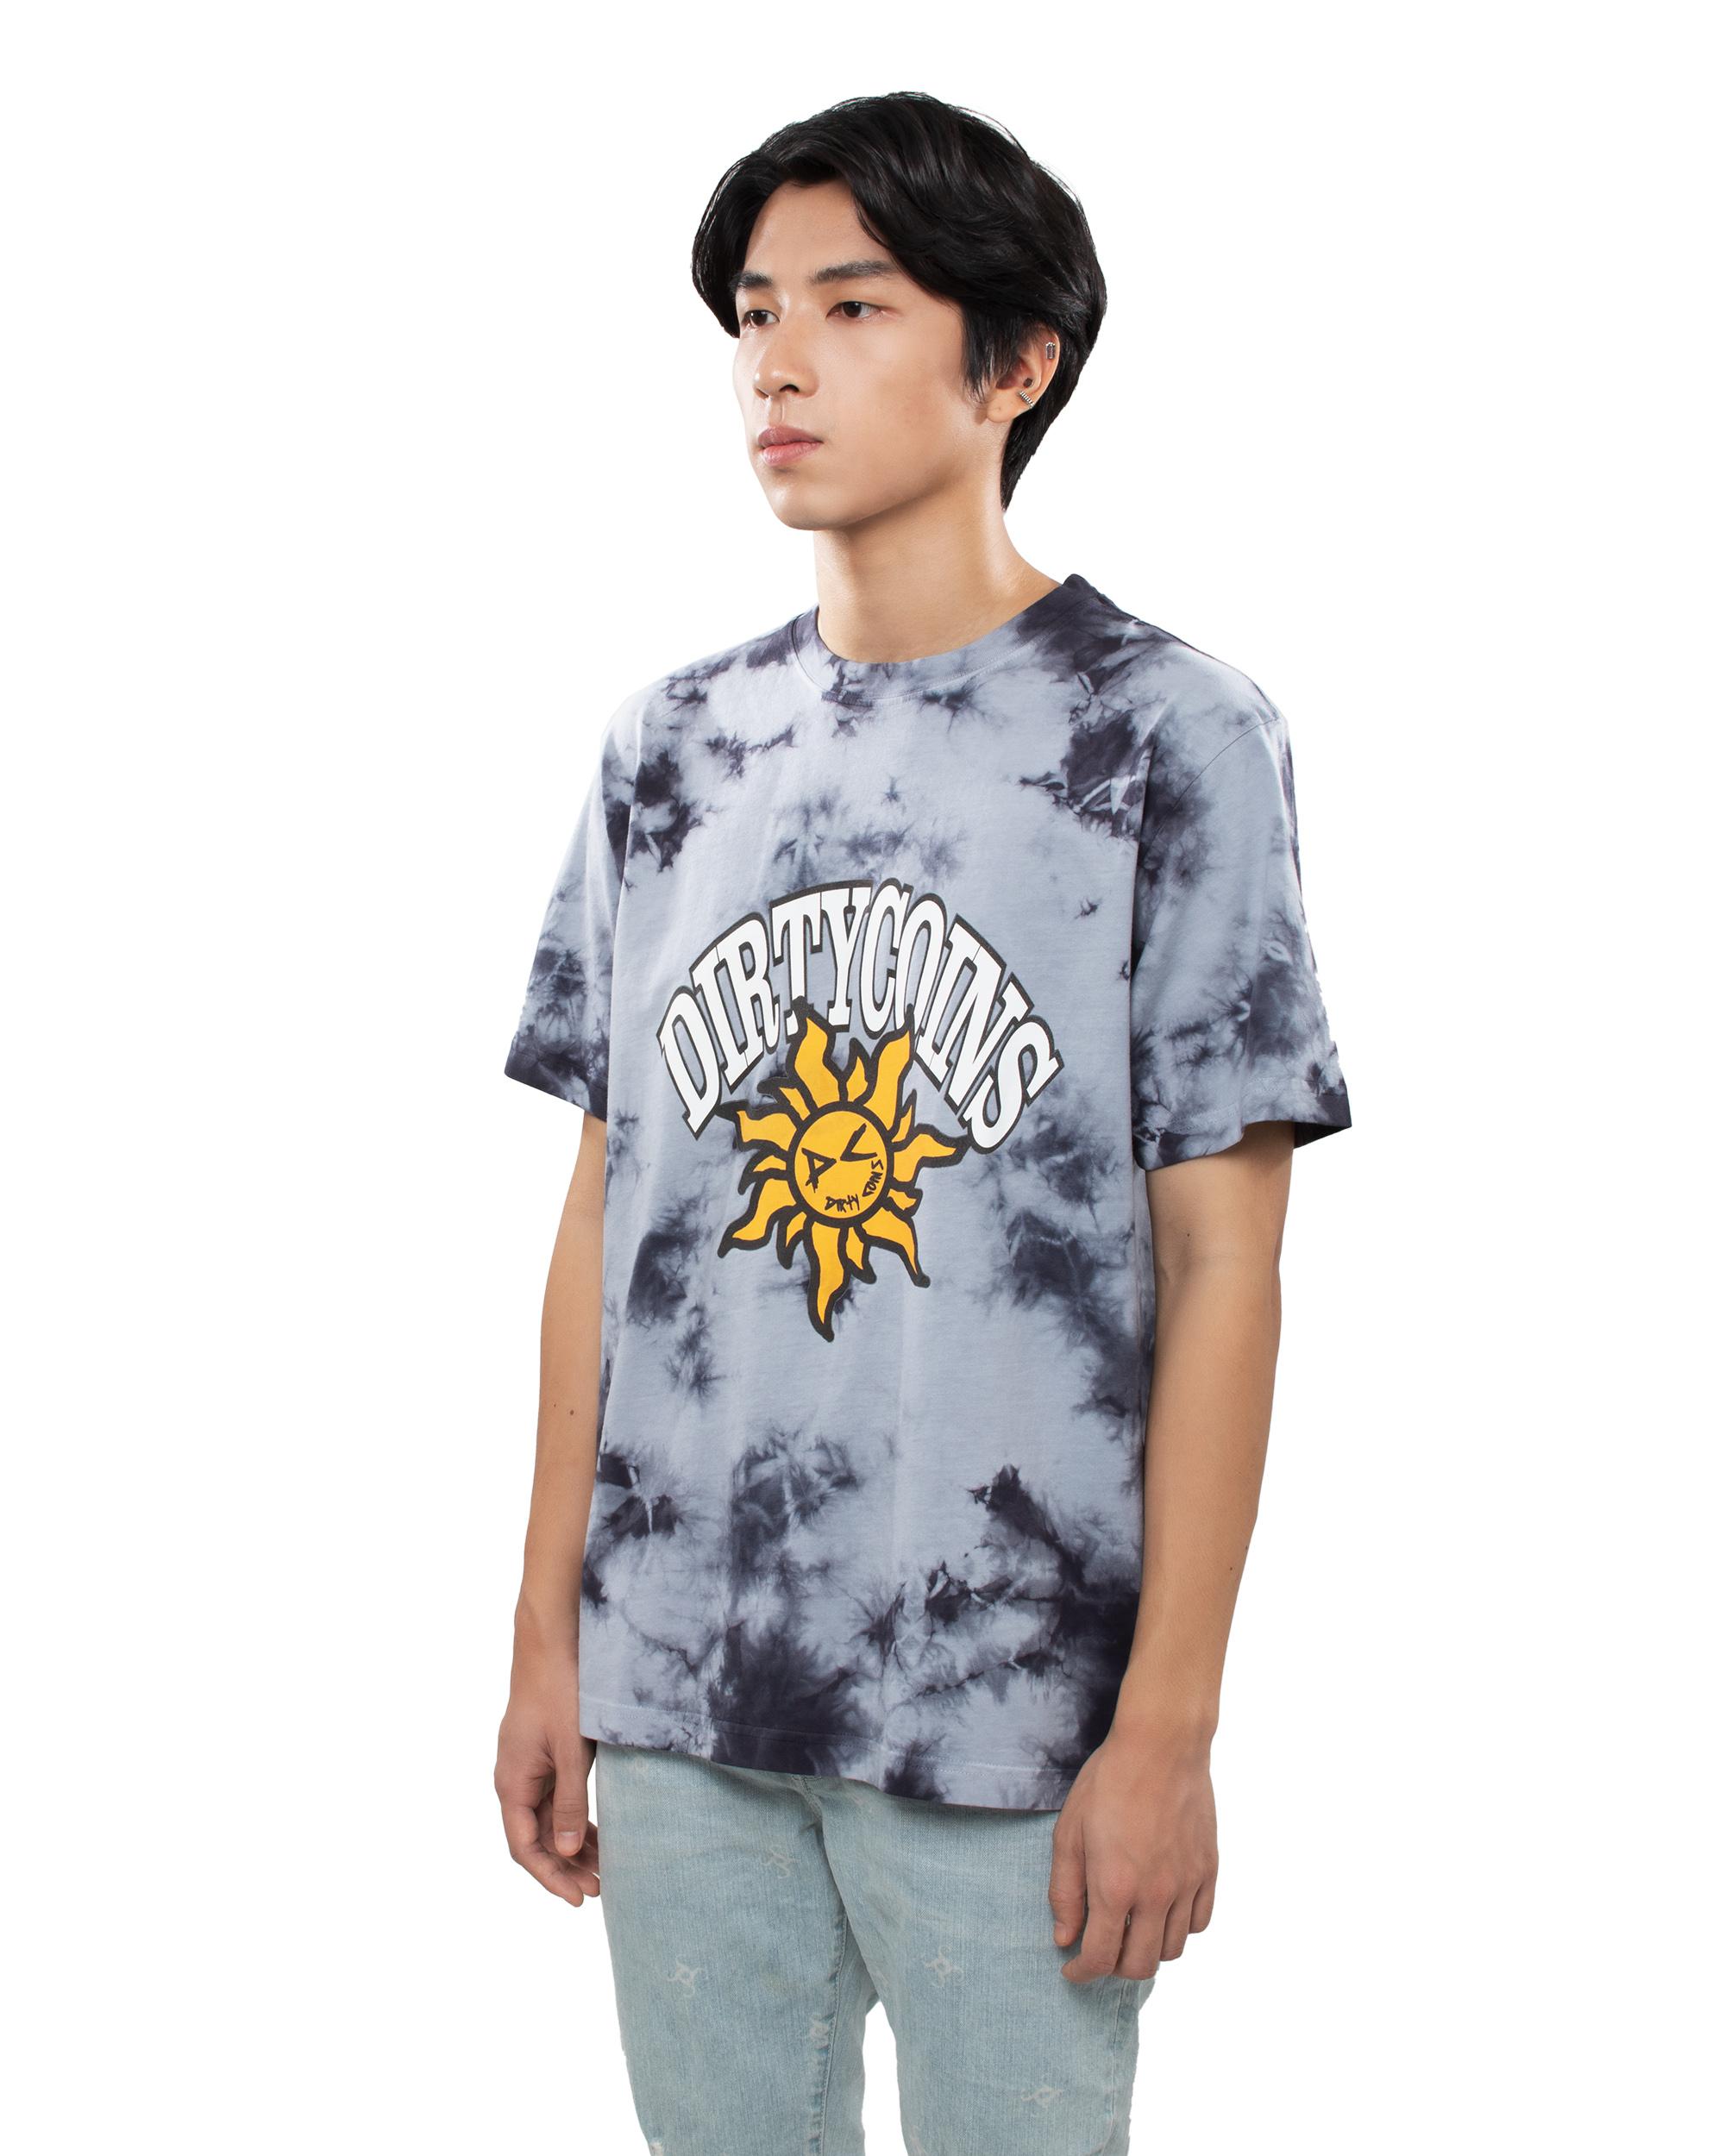 DirtyCoins Fukyba Tiedye T-Shirt - Grey